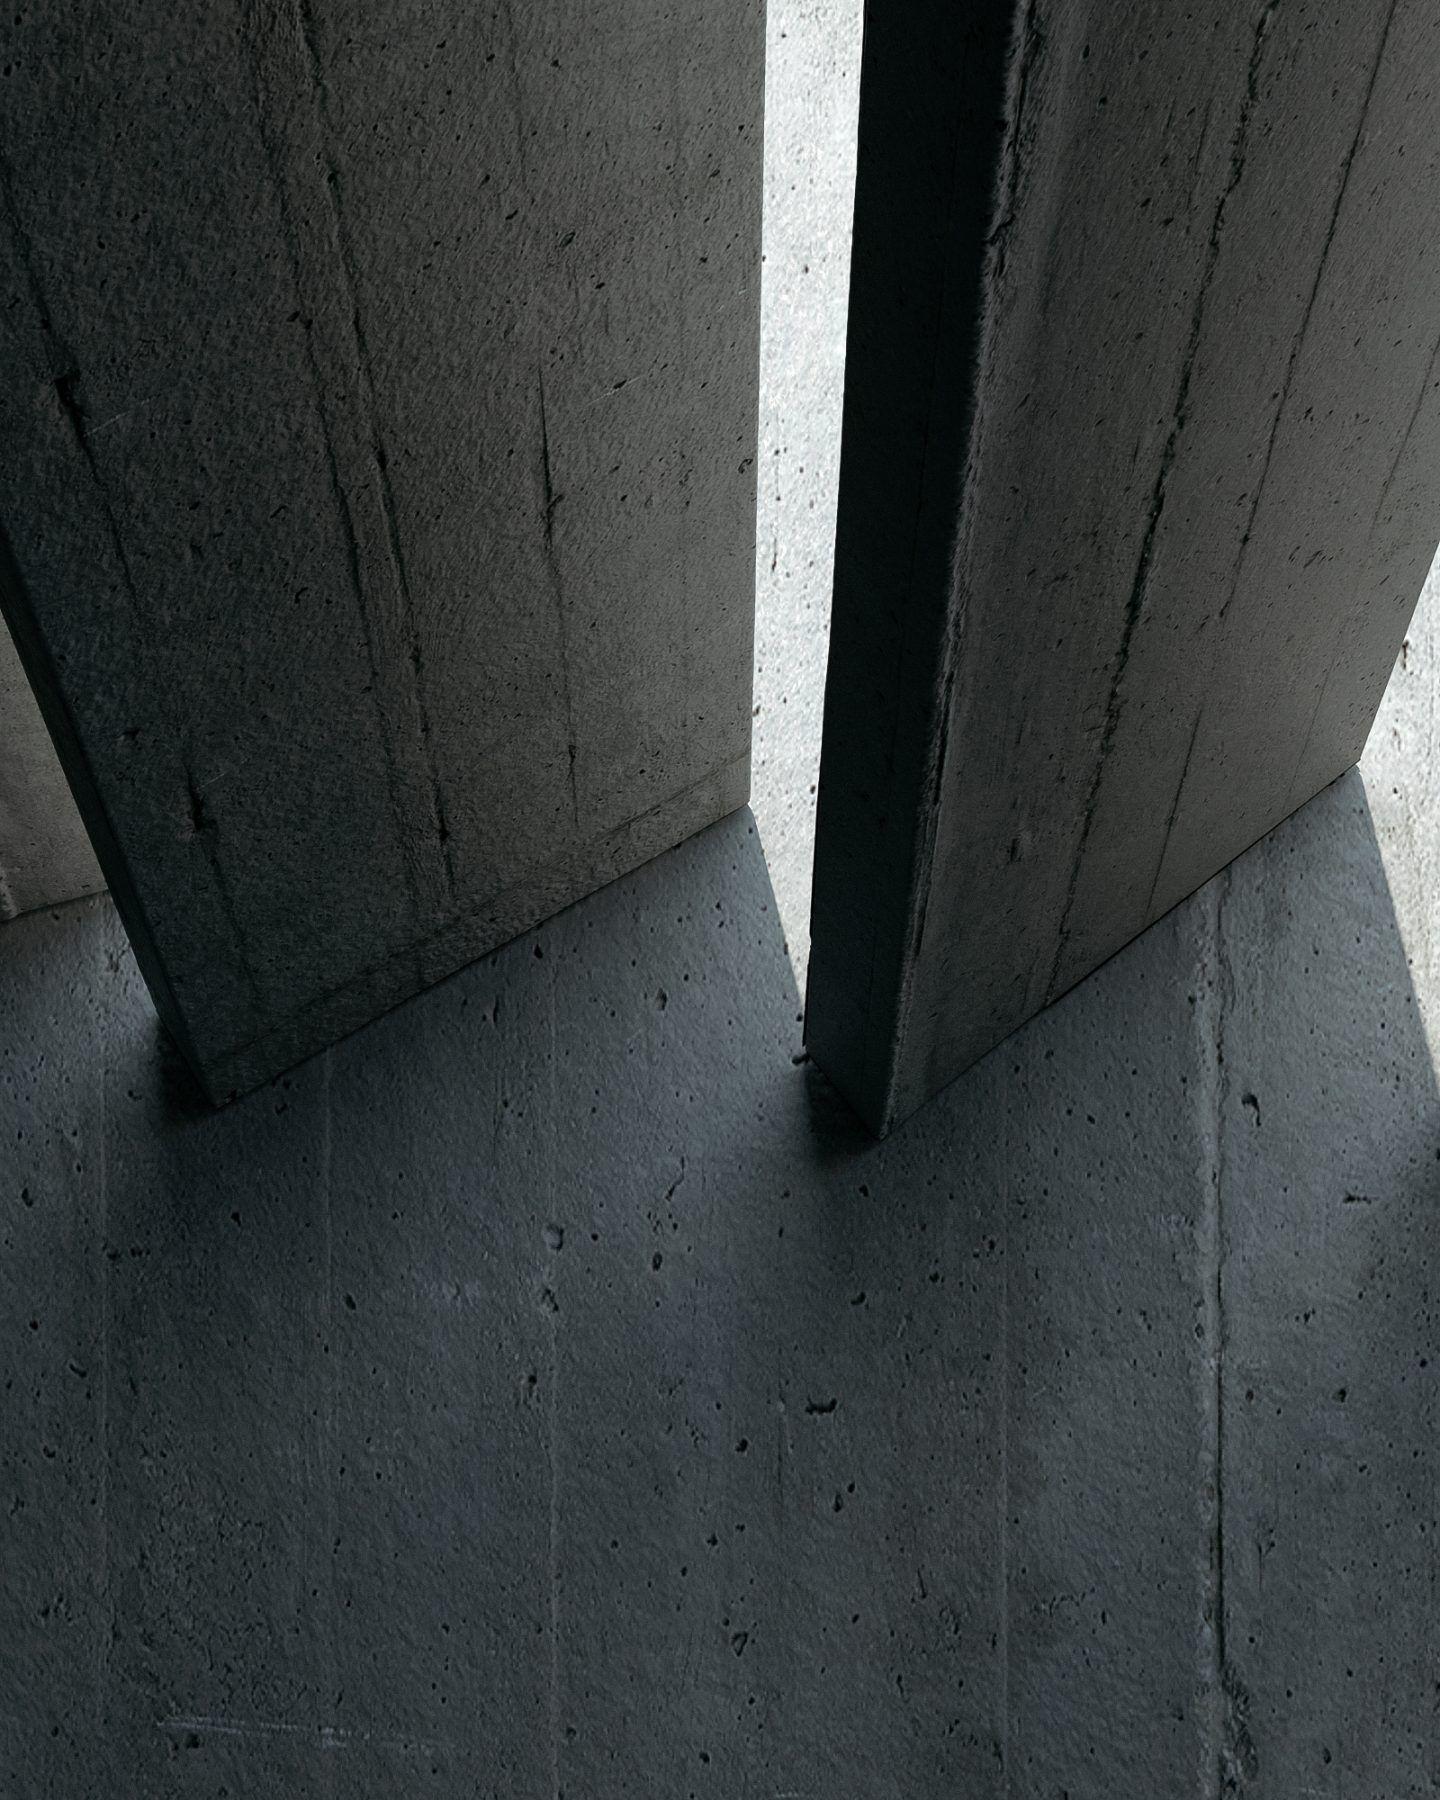 IGNANT-Tesla-cybertruck-cgi-brutalism-cgi-editorial-4